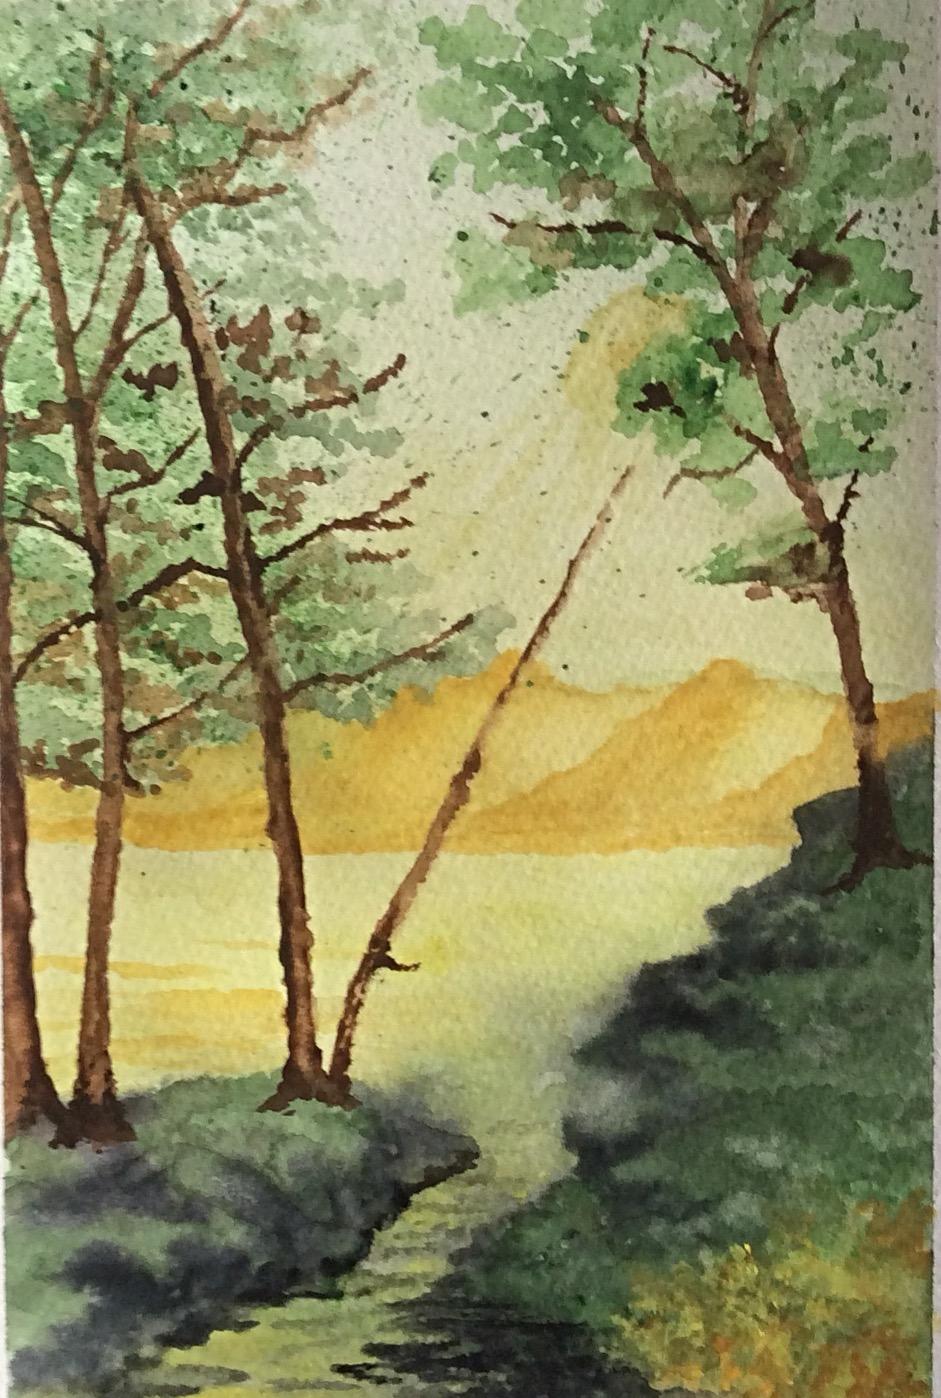 Ochre hills by Jennyben